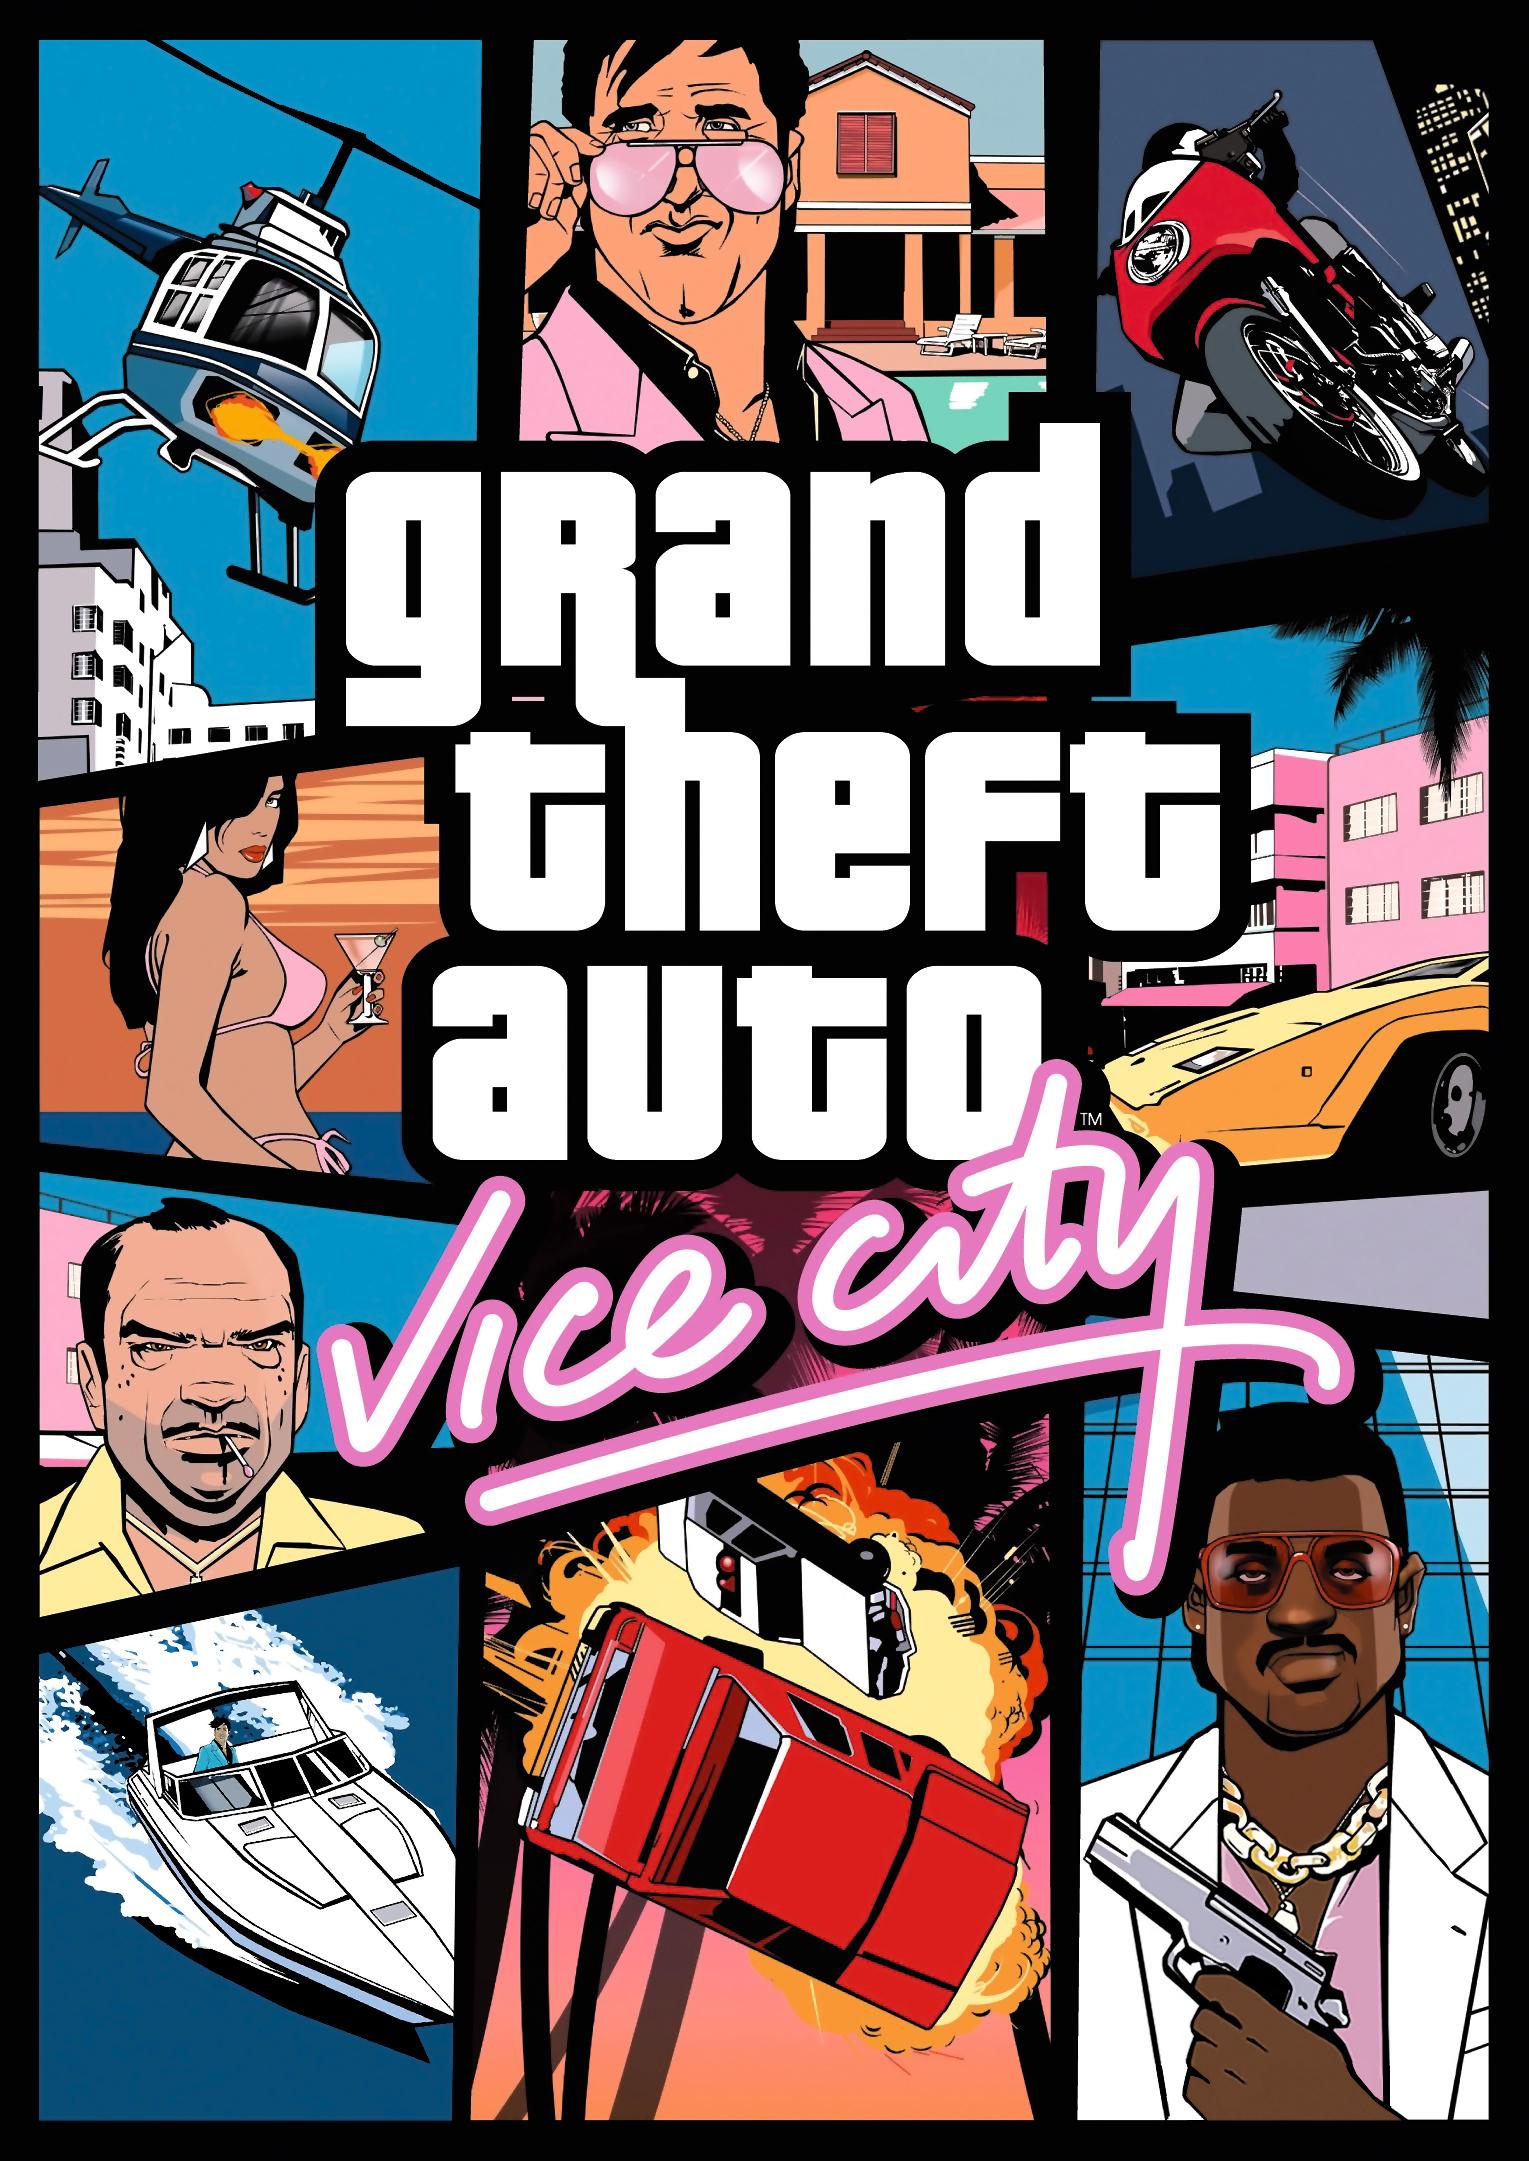 Vice city steam